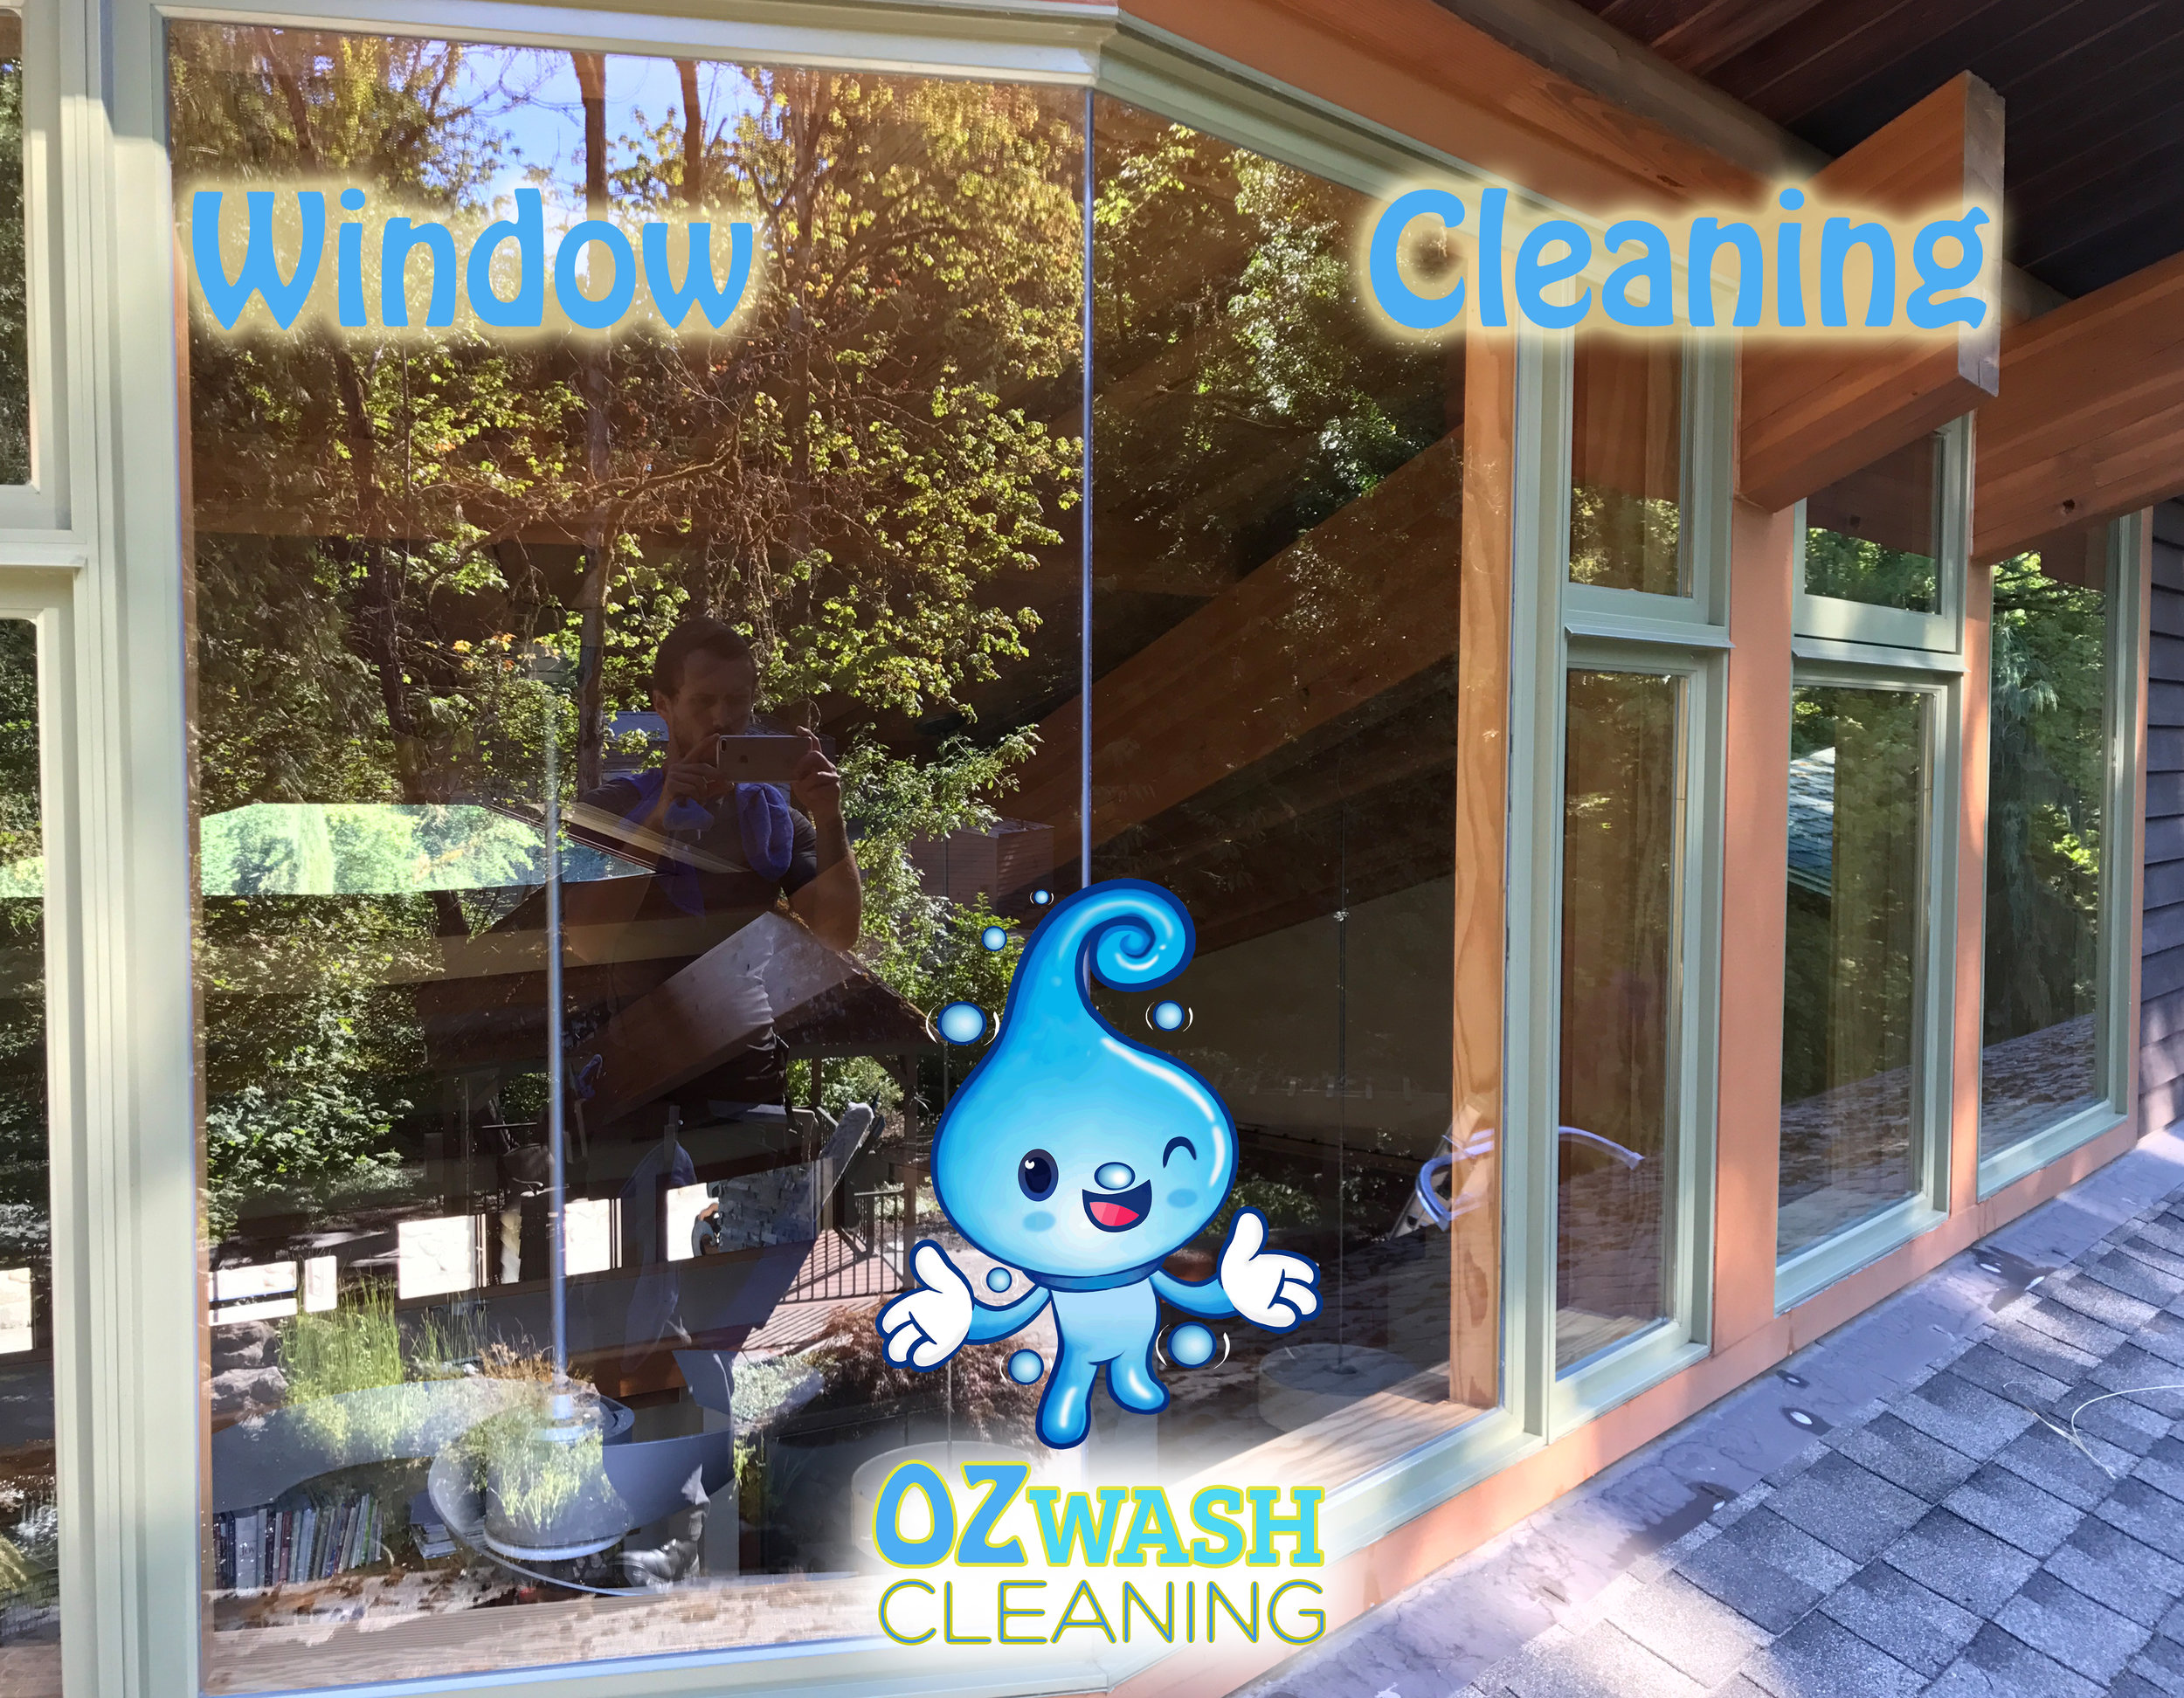 Window Cleaning2.jpg